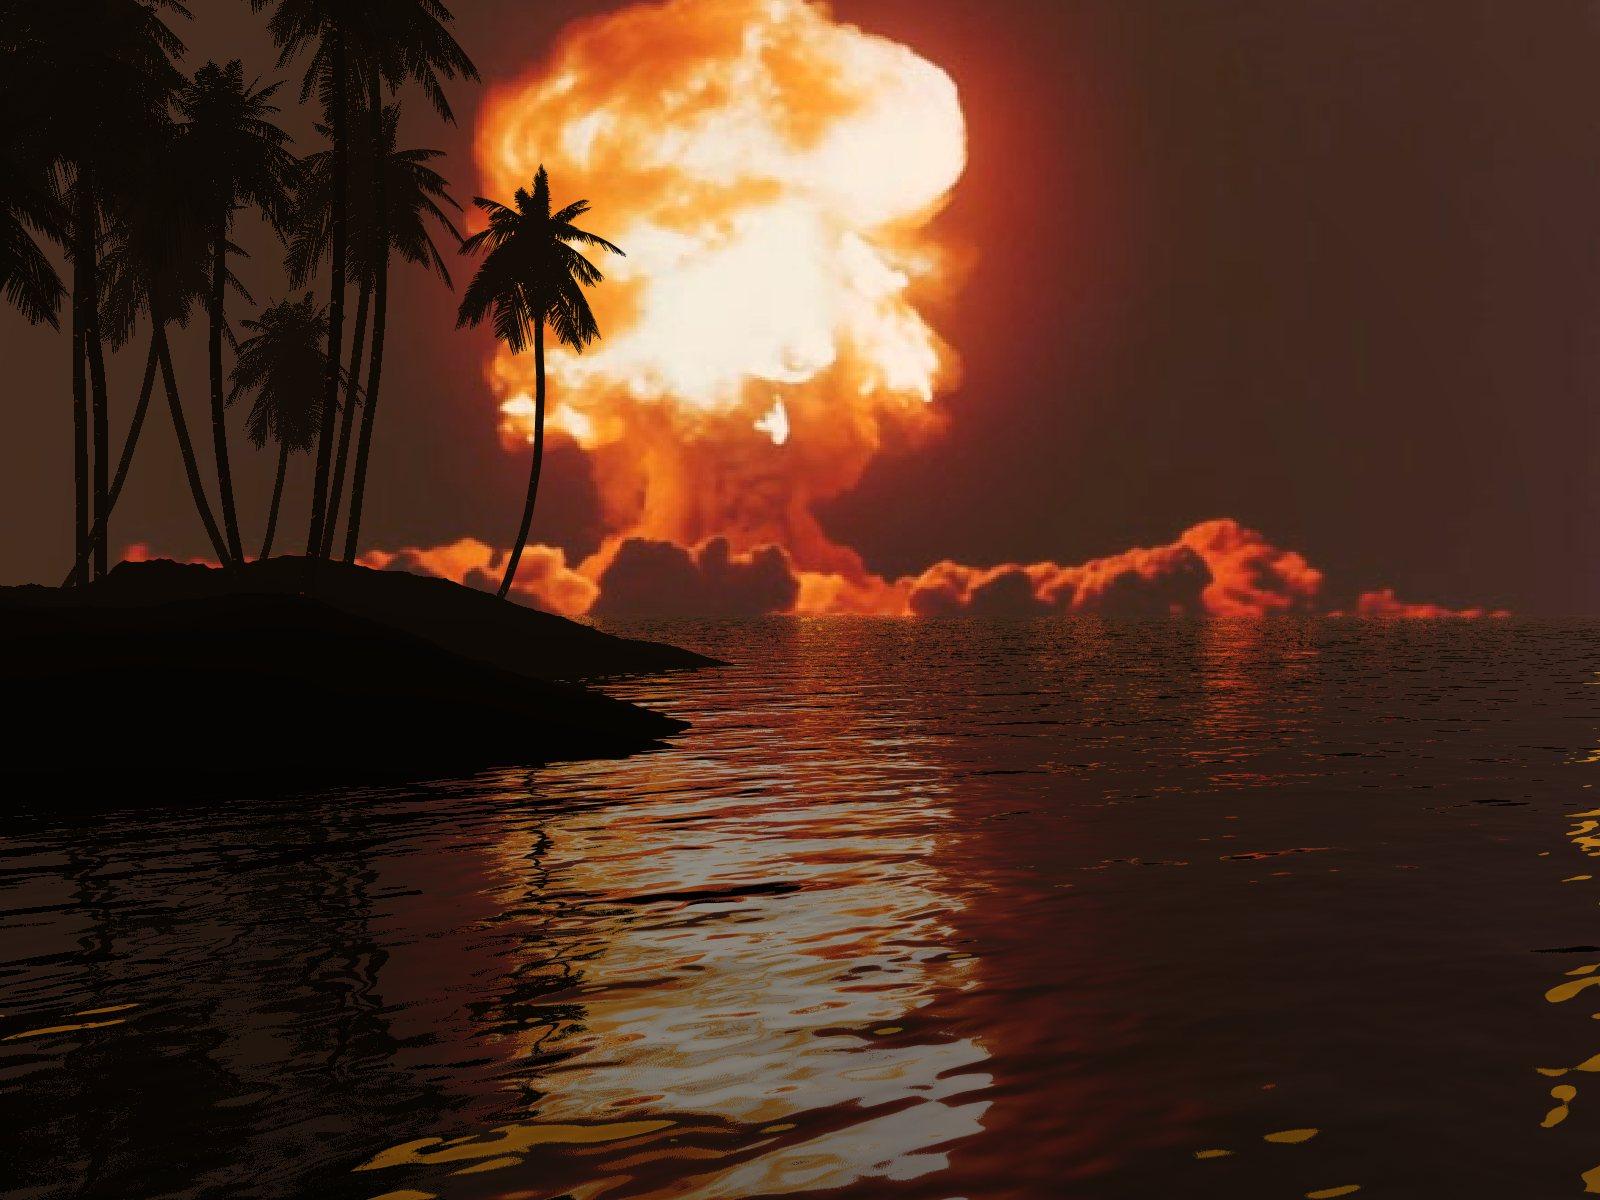 allwantsimgcom Nuclear Explosion Wallpaper HD 1600x1200